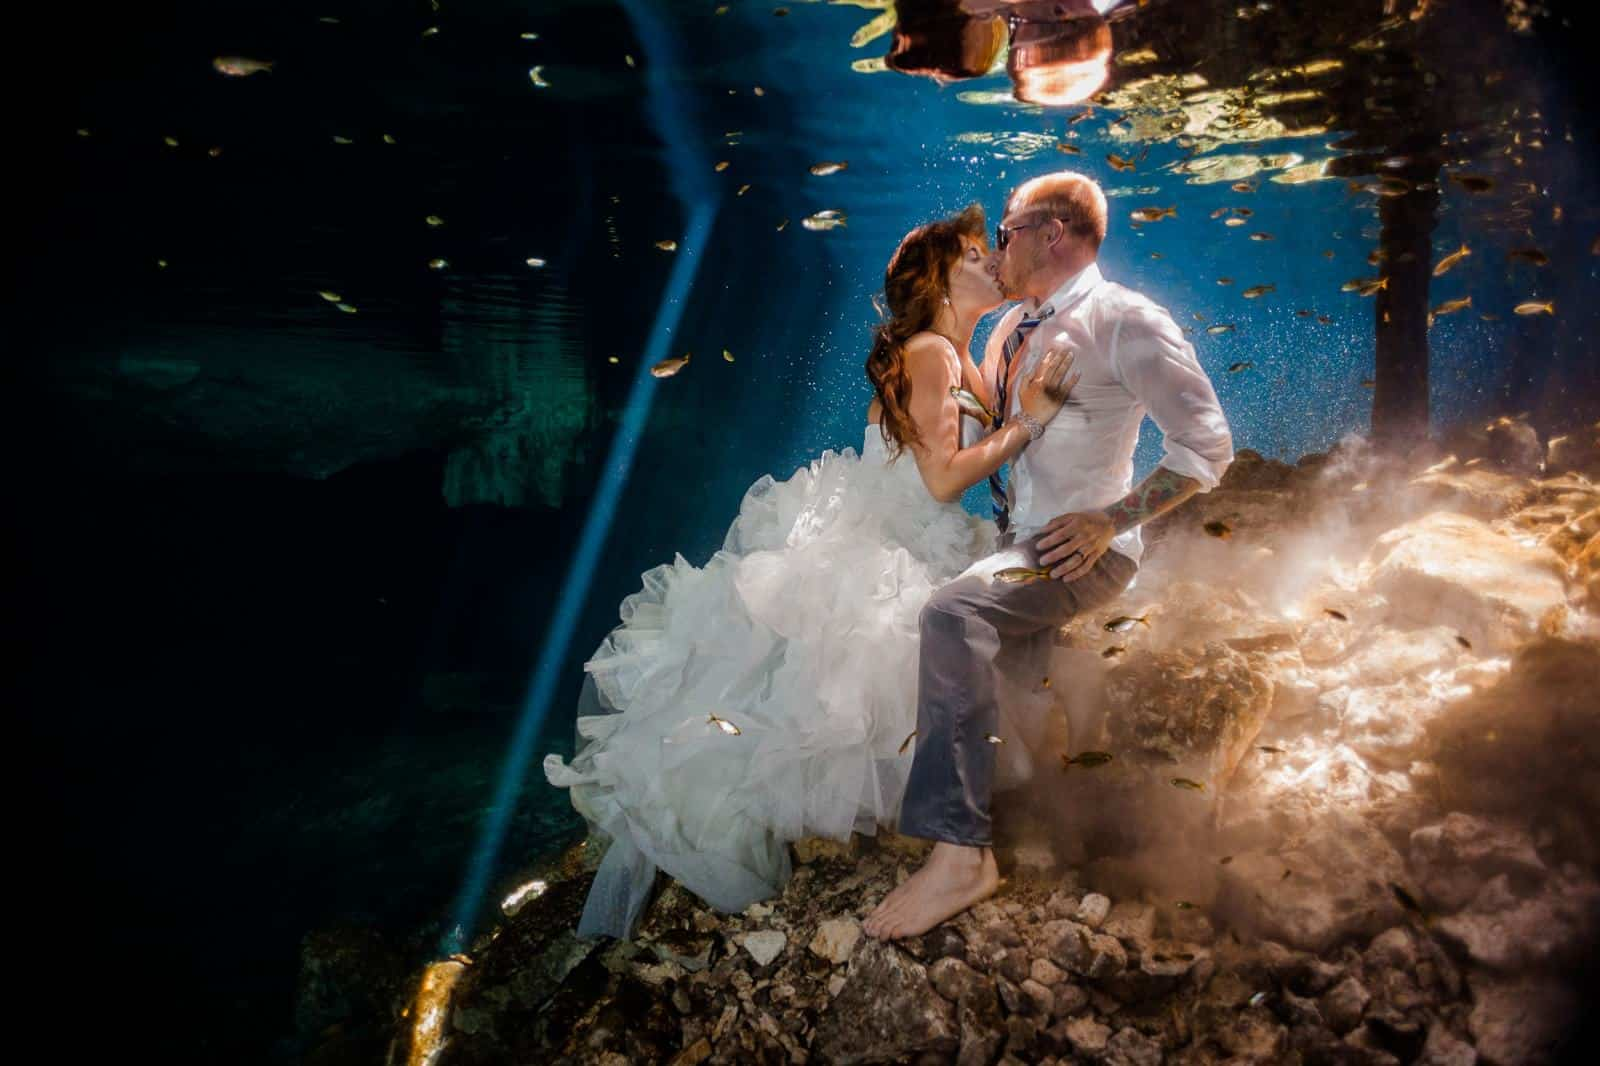 Underwater the Trash Dress